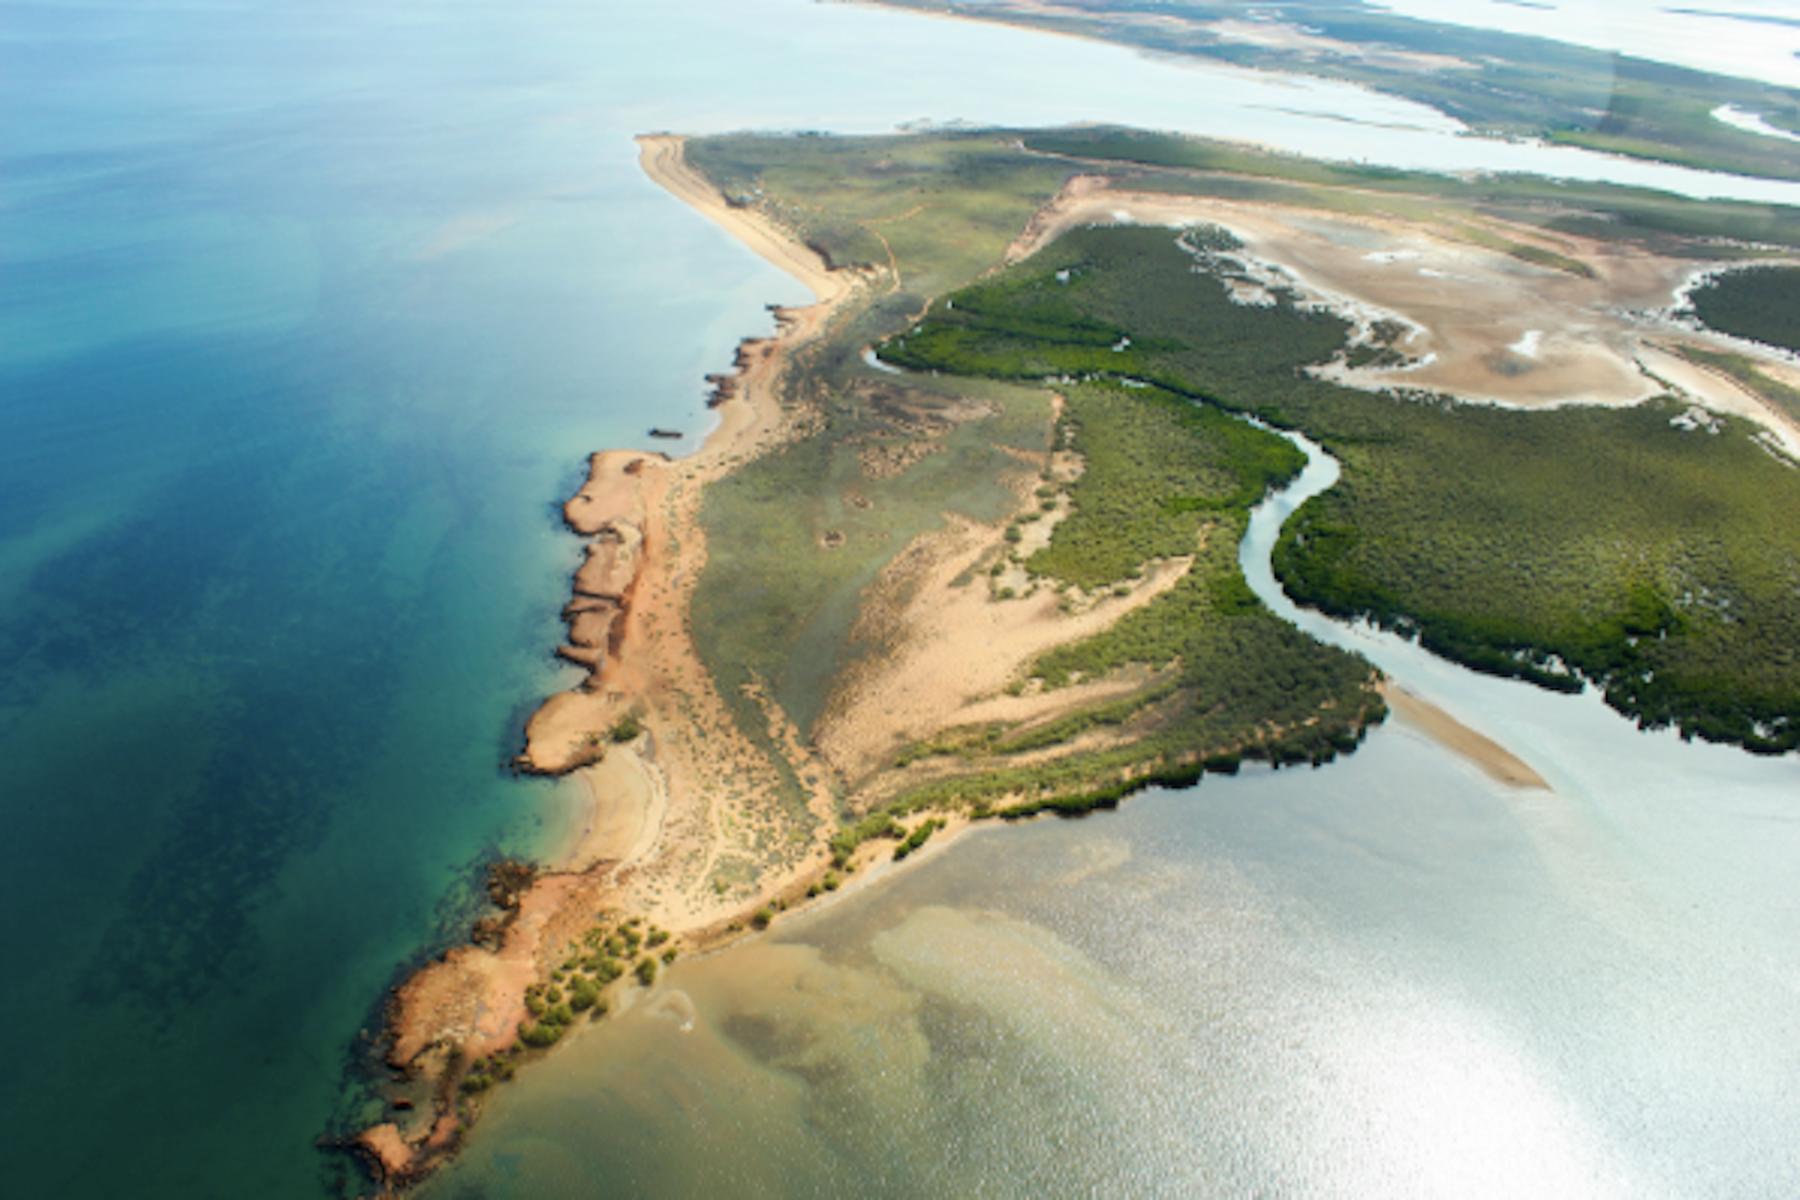 Private Islands for Sale at Wilderness Island Exmouth Gulf, Western Australia 6707 Australia